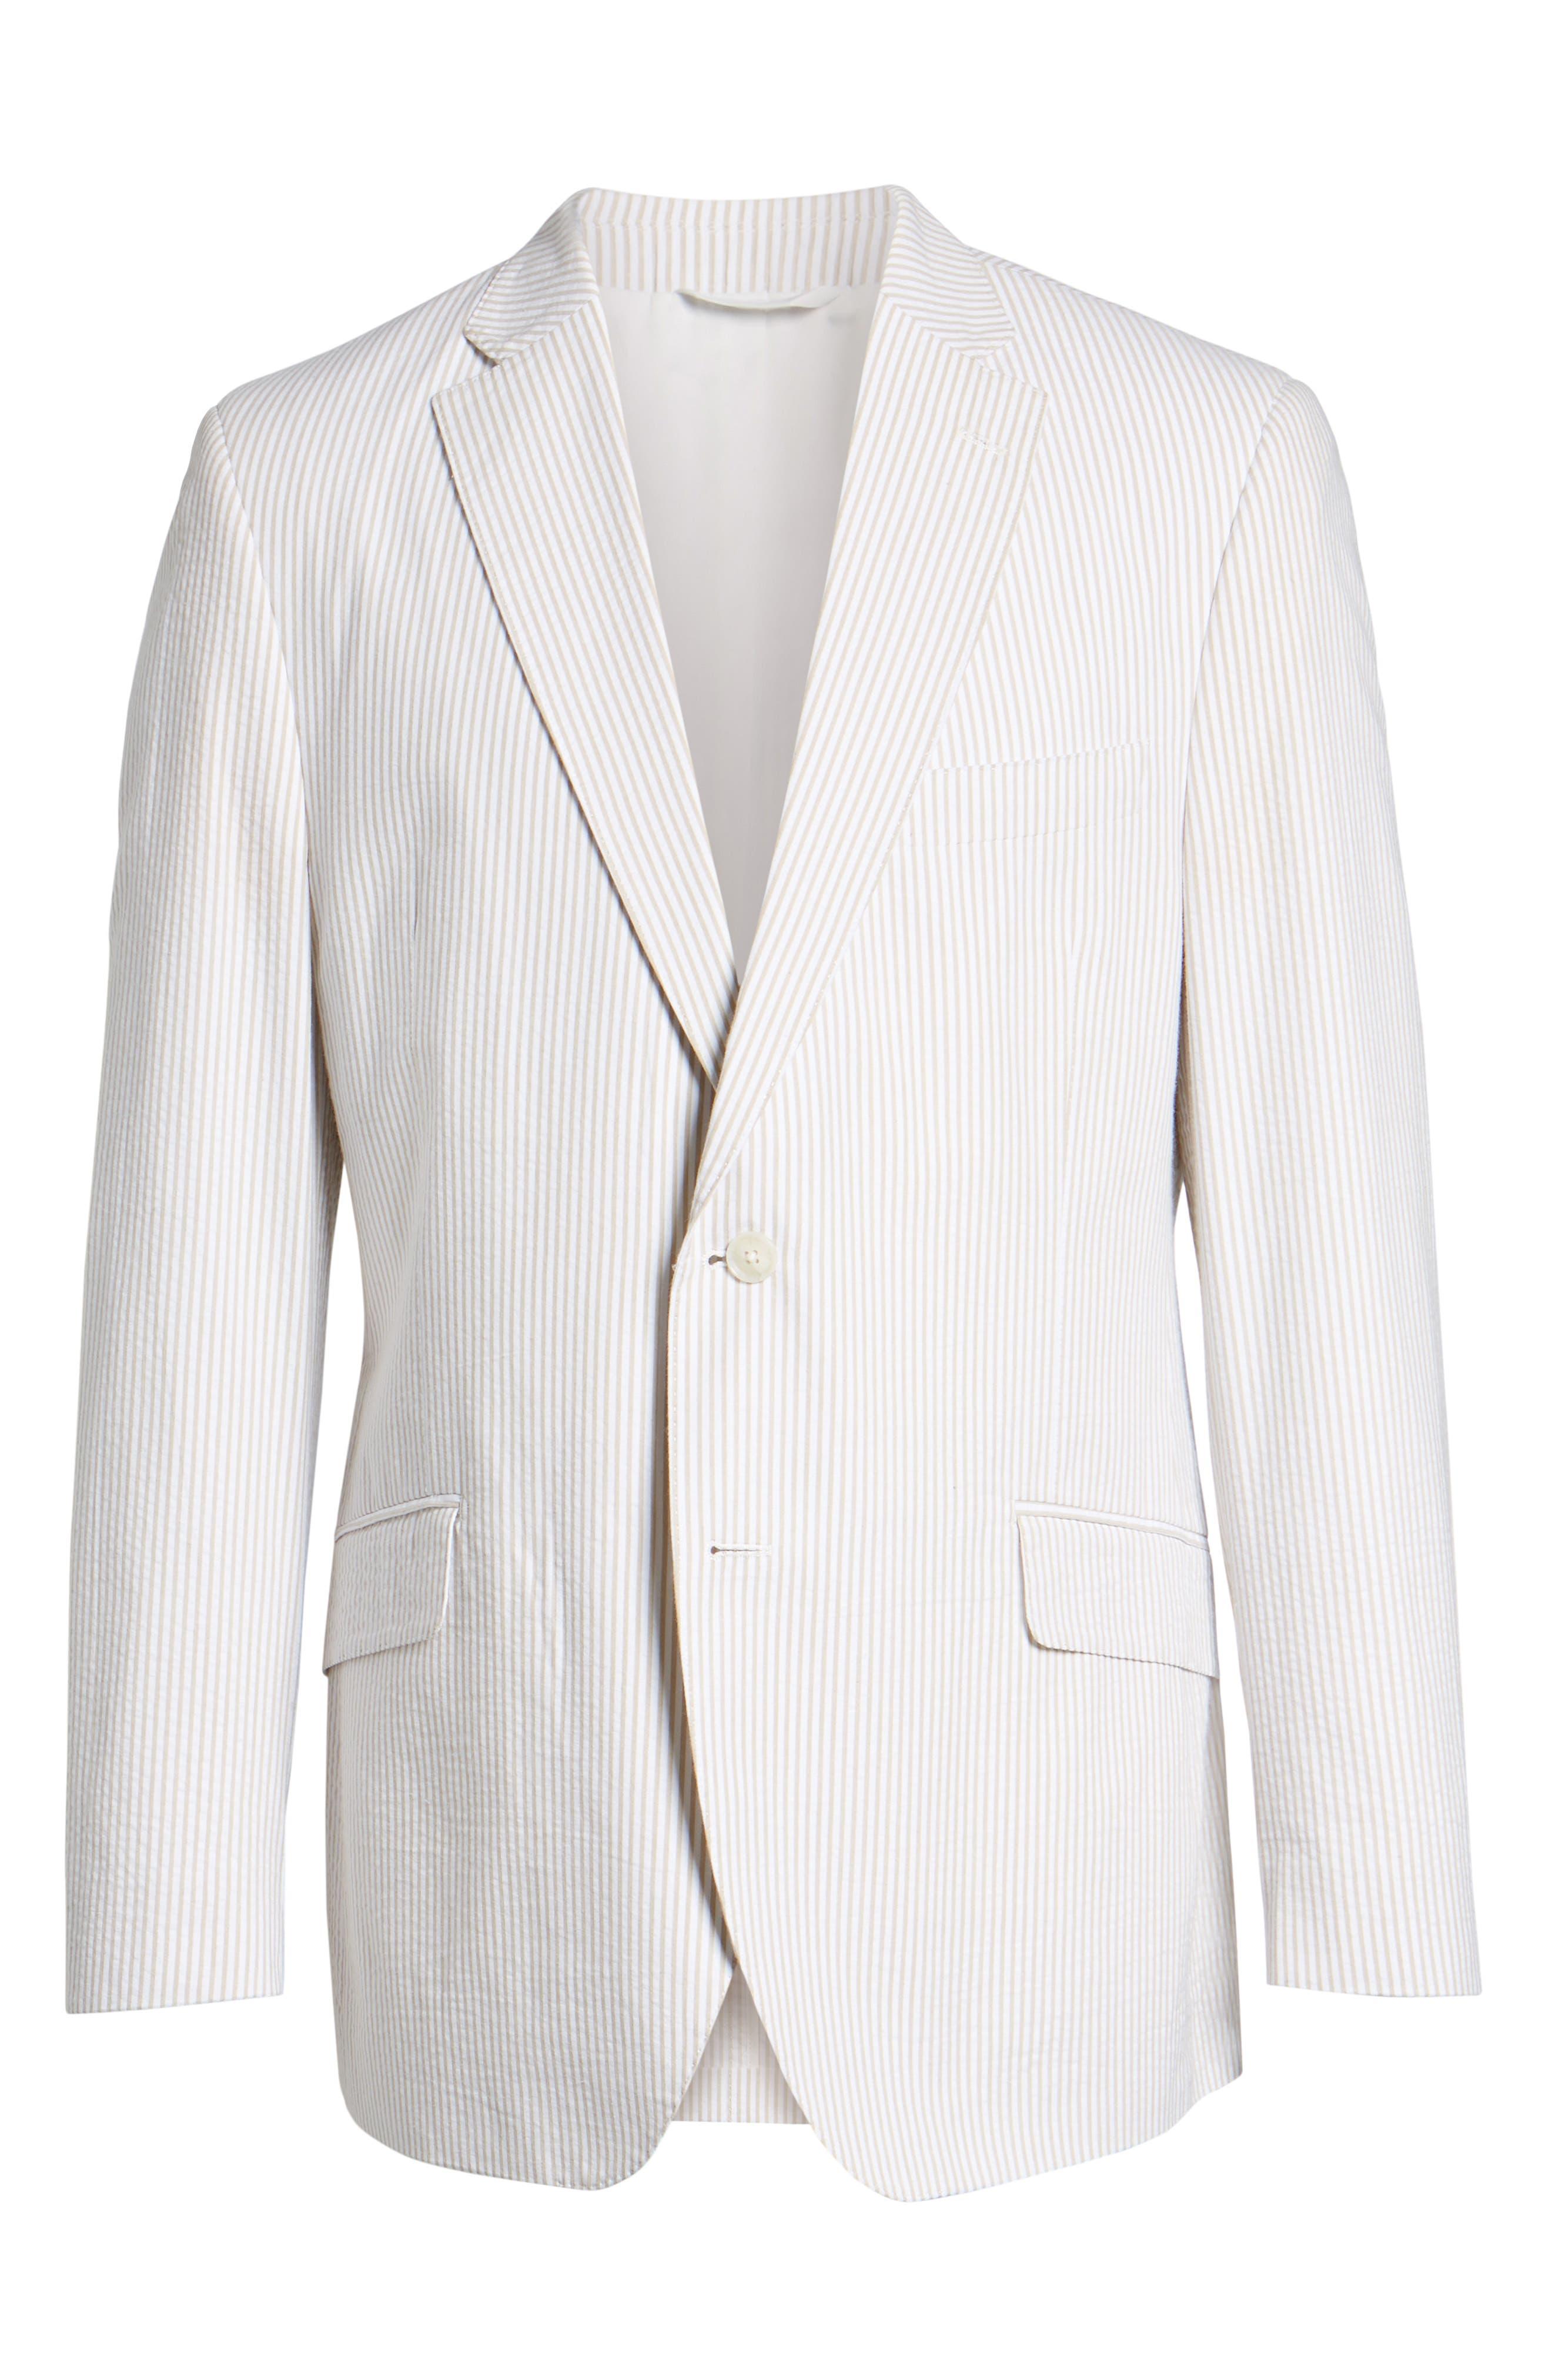 Jack AIM Classic Fit Seersucker Sport Coat,                             Alternate thumbnail 5, color,                             TAN AND WHITE